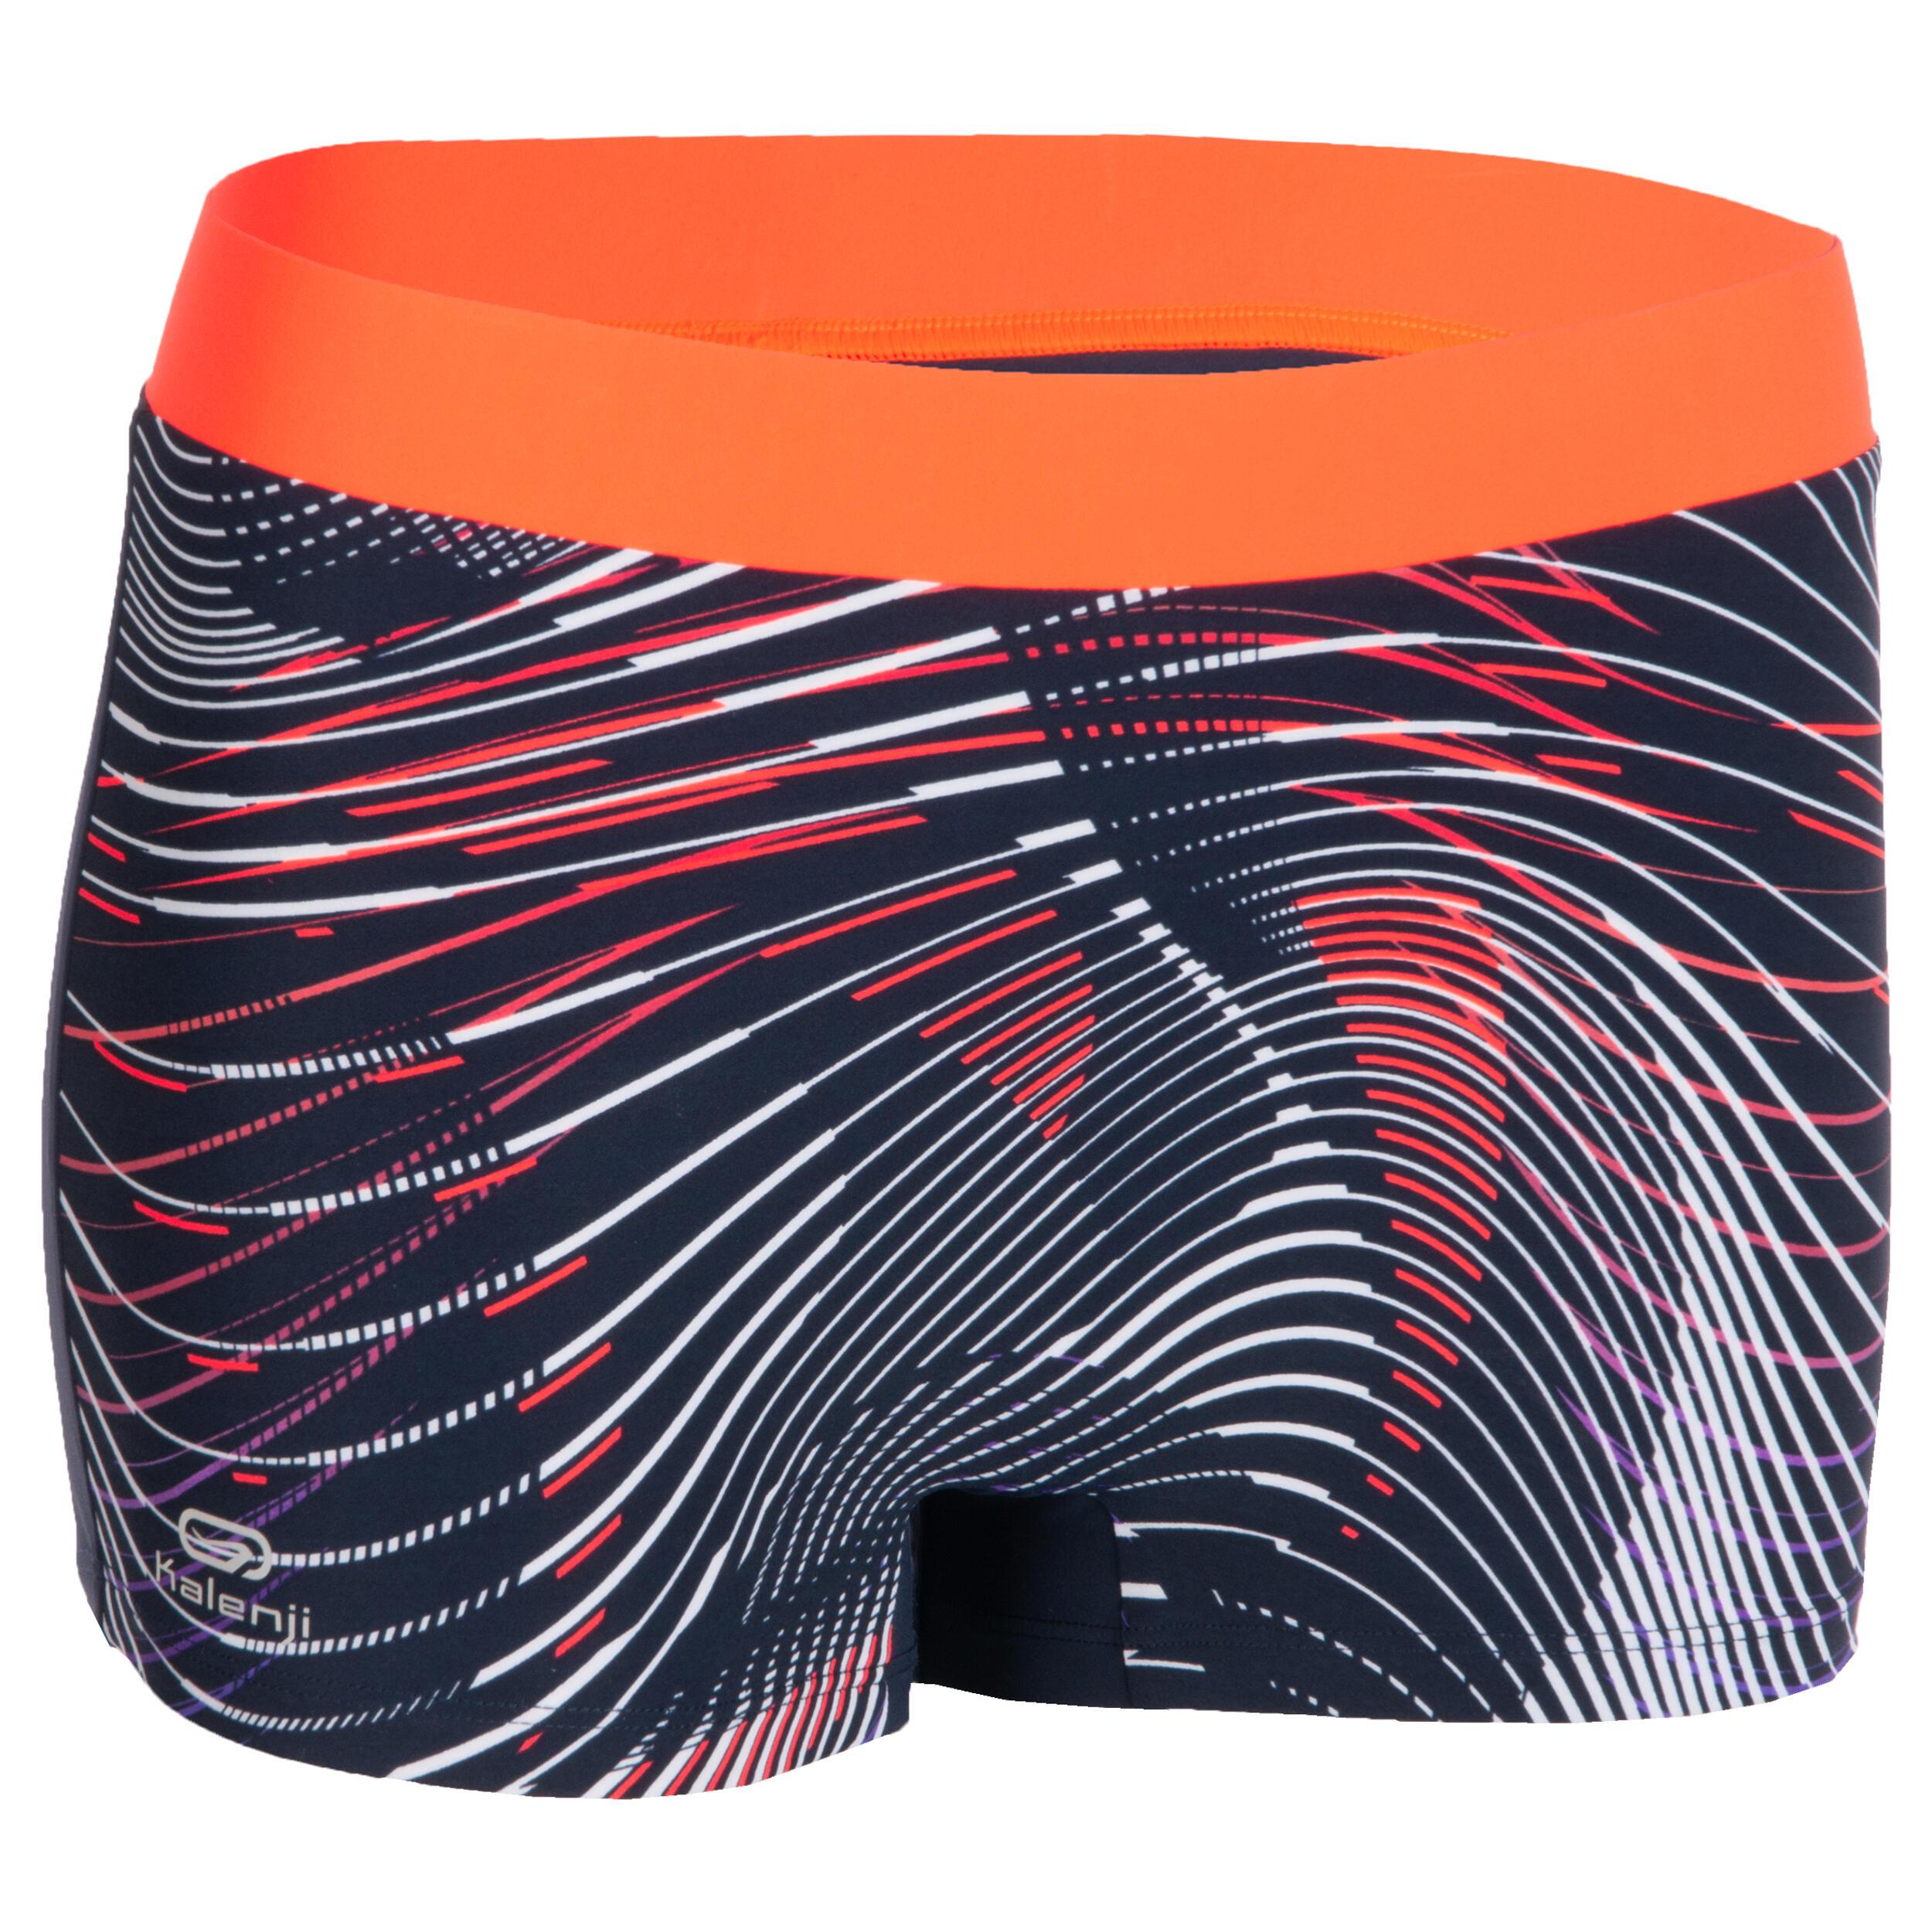 Laufhose Shorty Damen blau/orange | Sportbekleidung > Sporthosen > Laufhosen | Kalenji